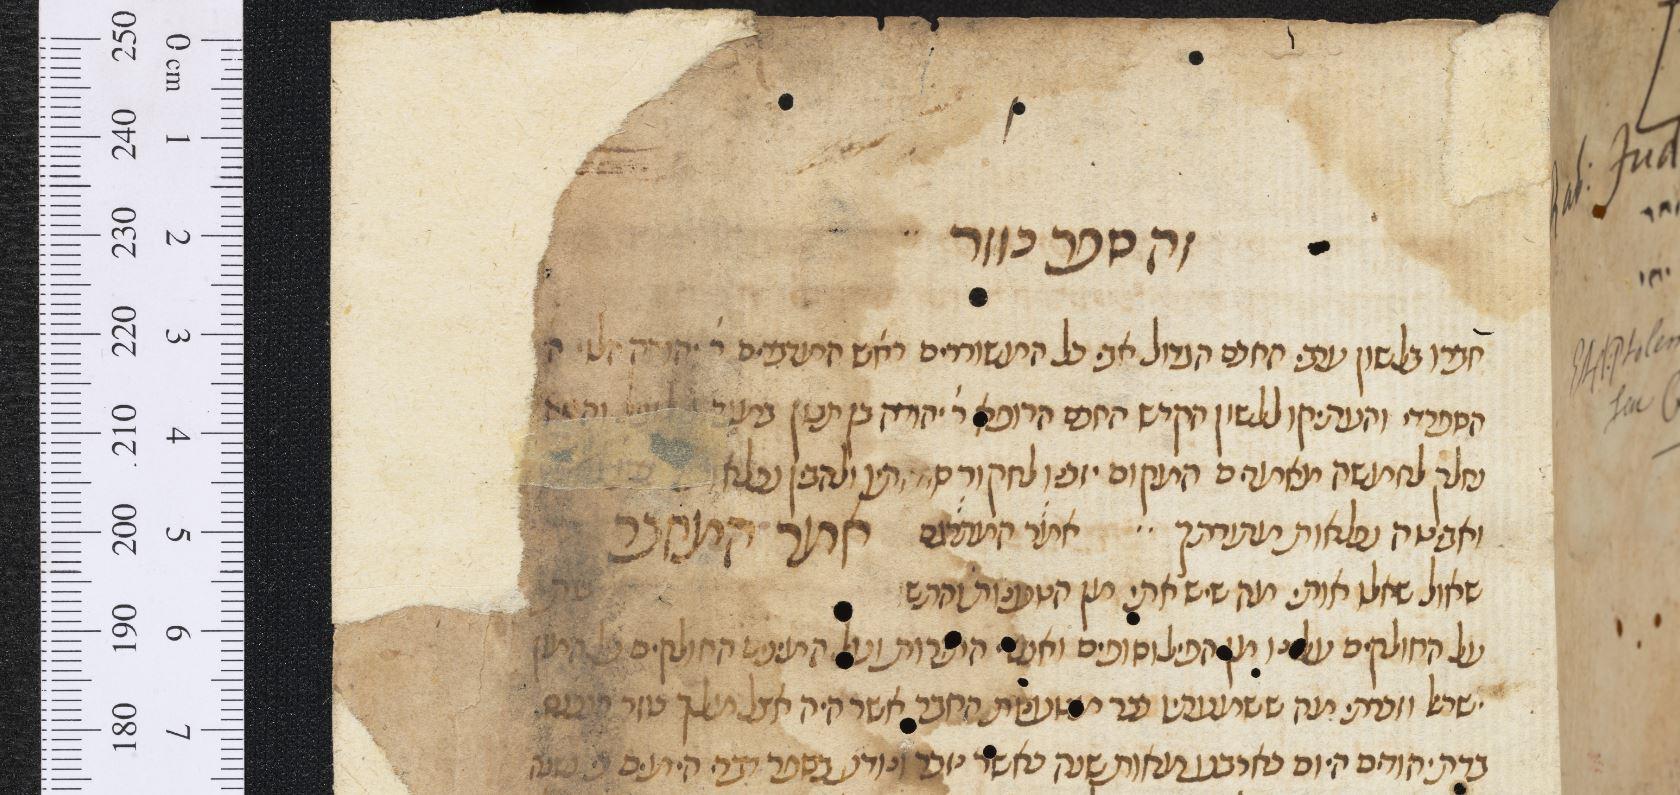 Leaf 1r - ha-Kuzari, Yehuda Halevi, Bodleian Libraries, University of Oxfor